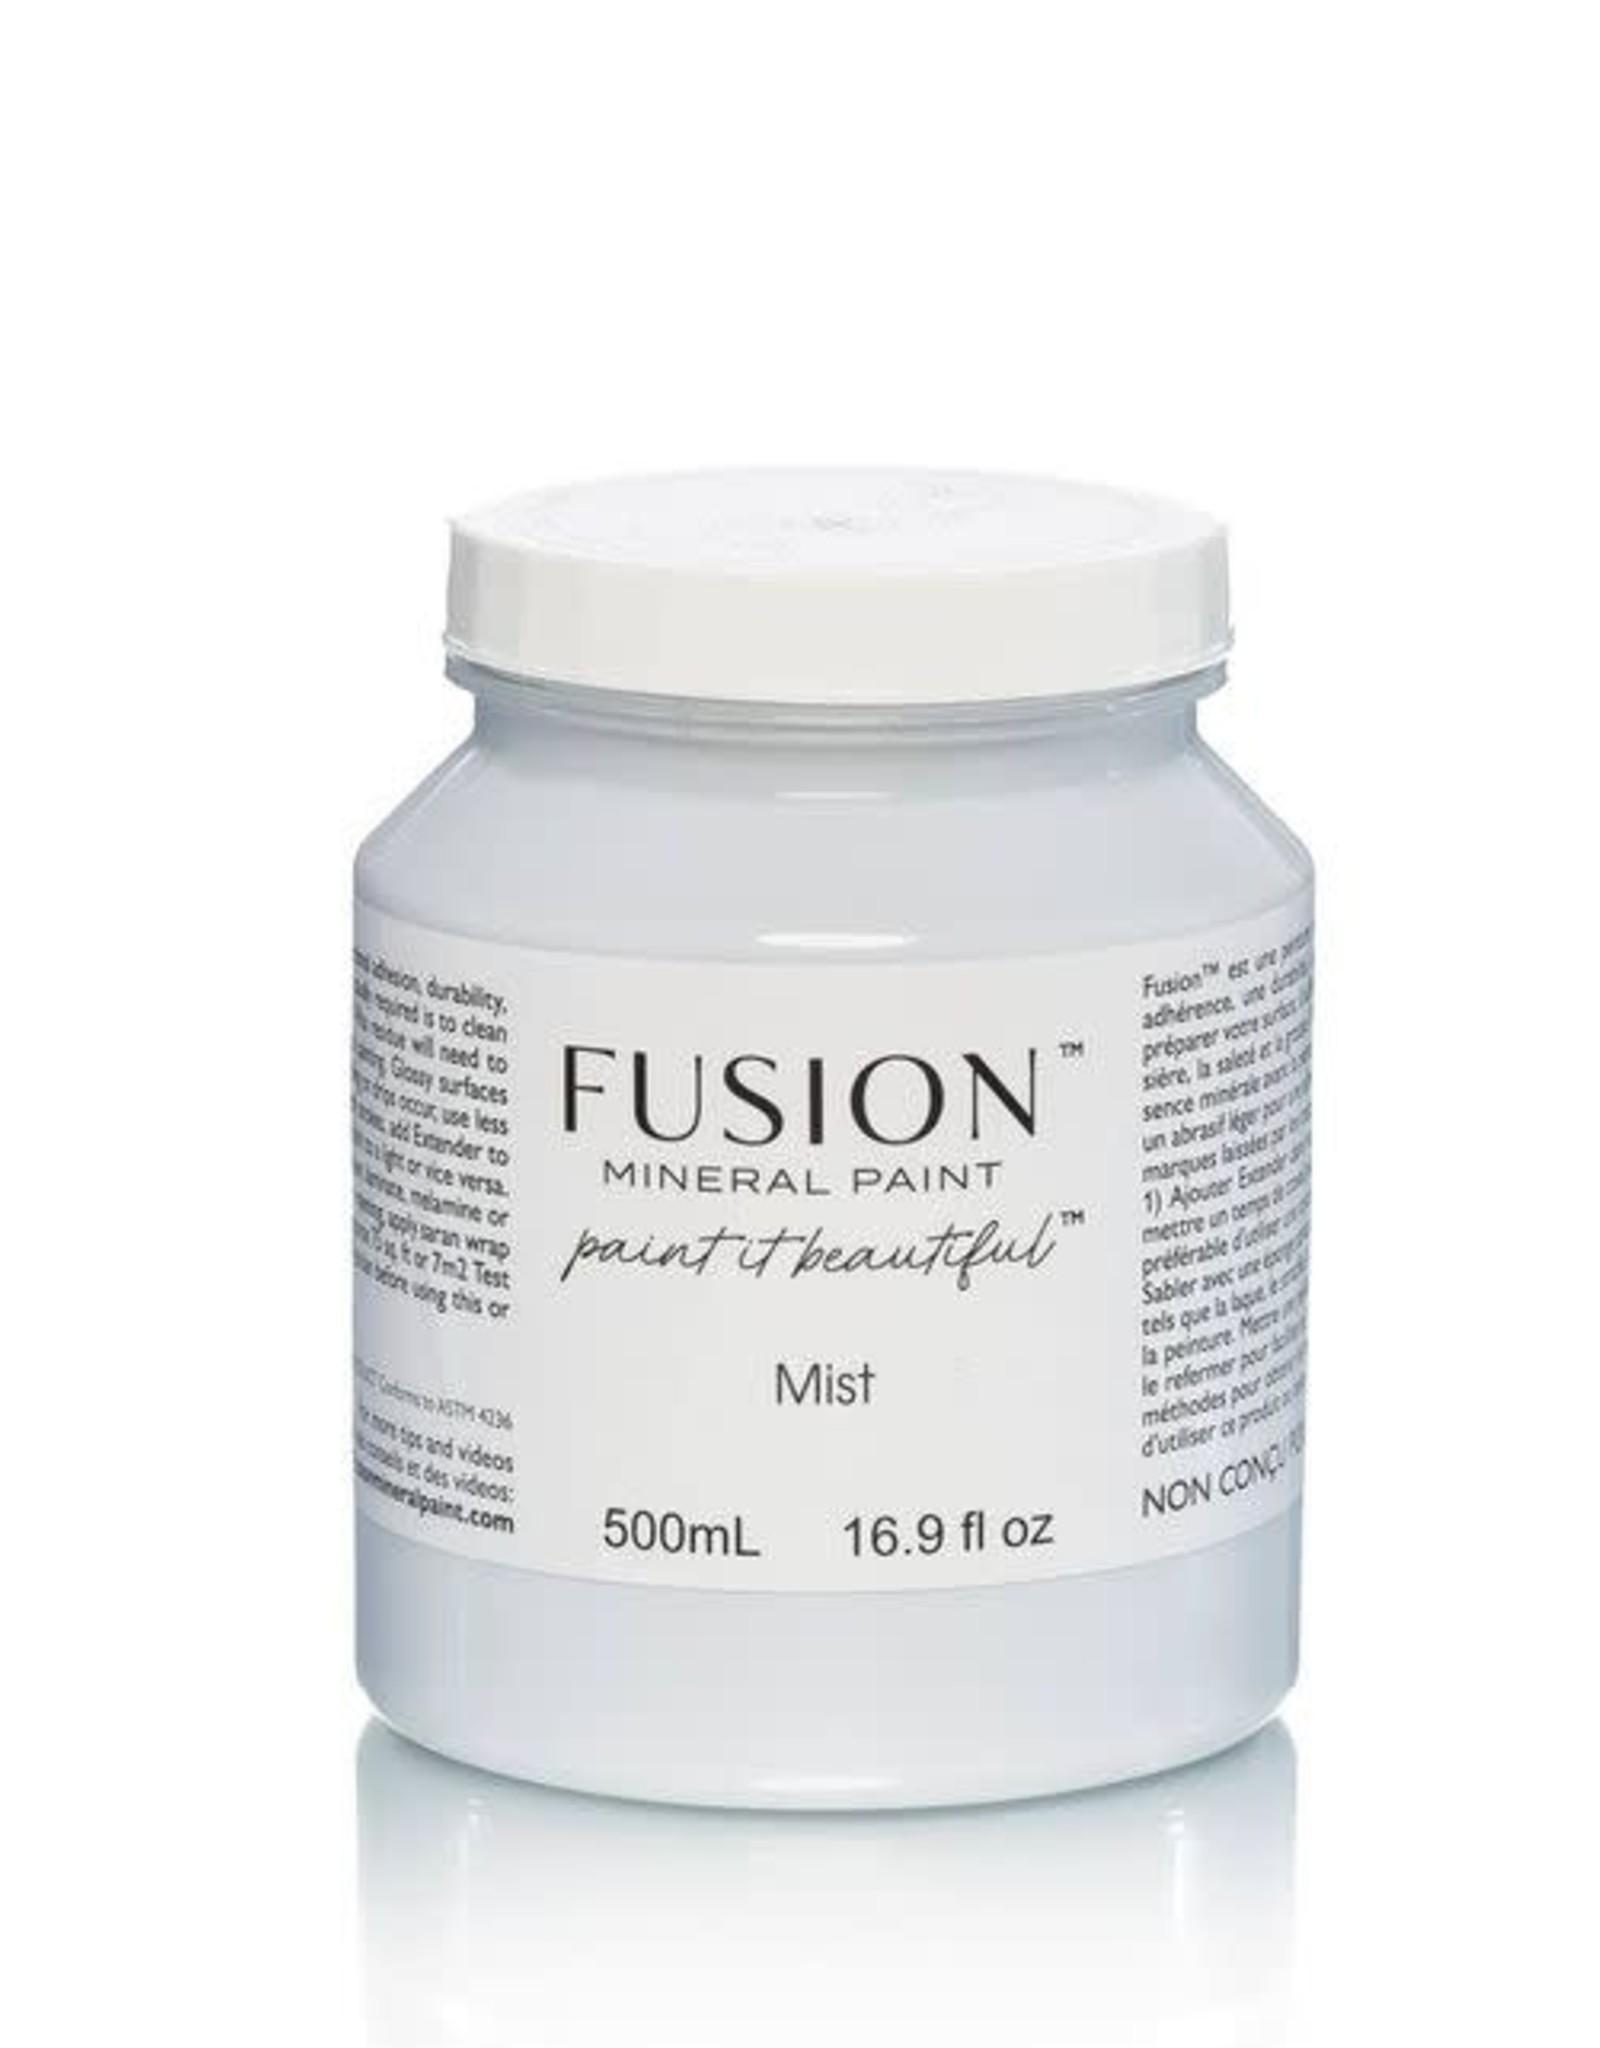 Fusion Mineral Paint Fusion Mineral Paint - Mist 500ml